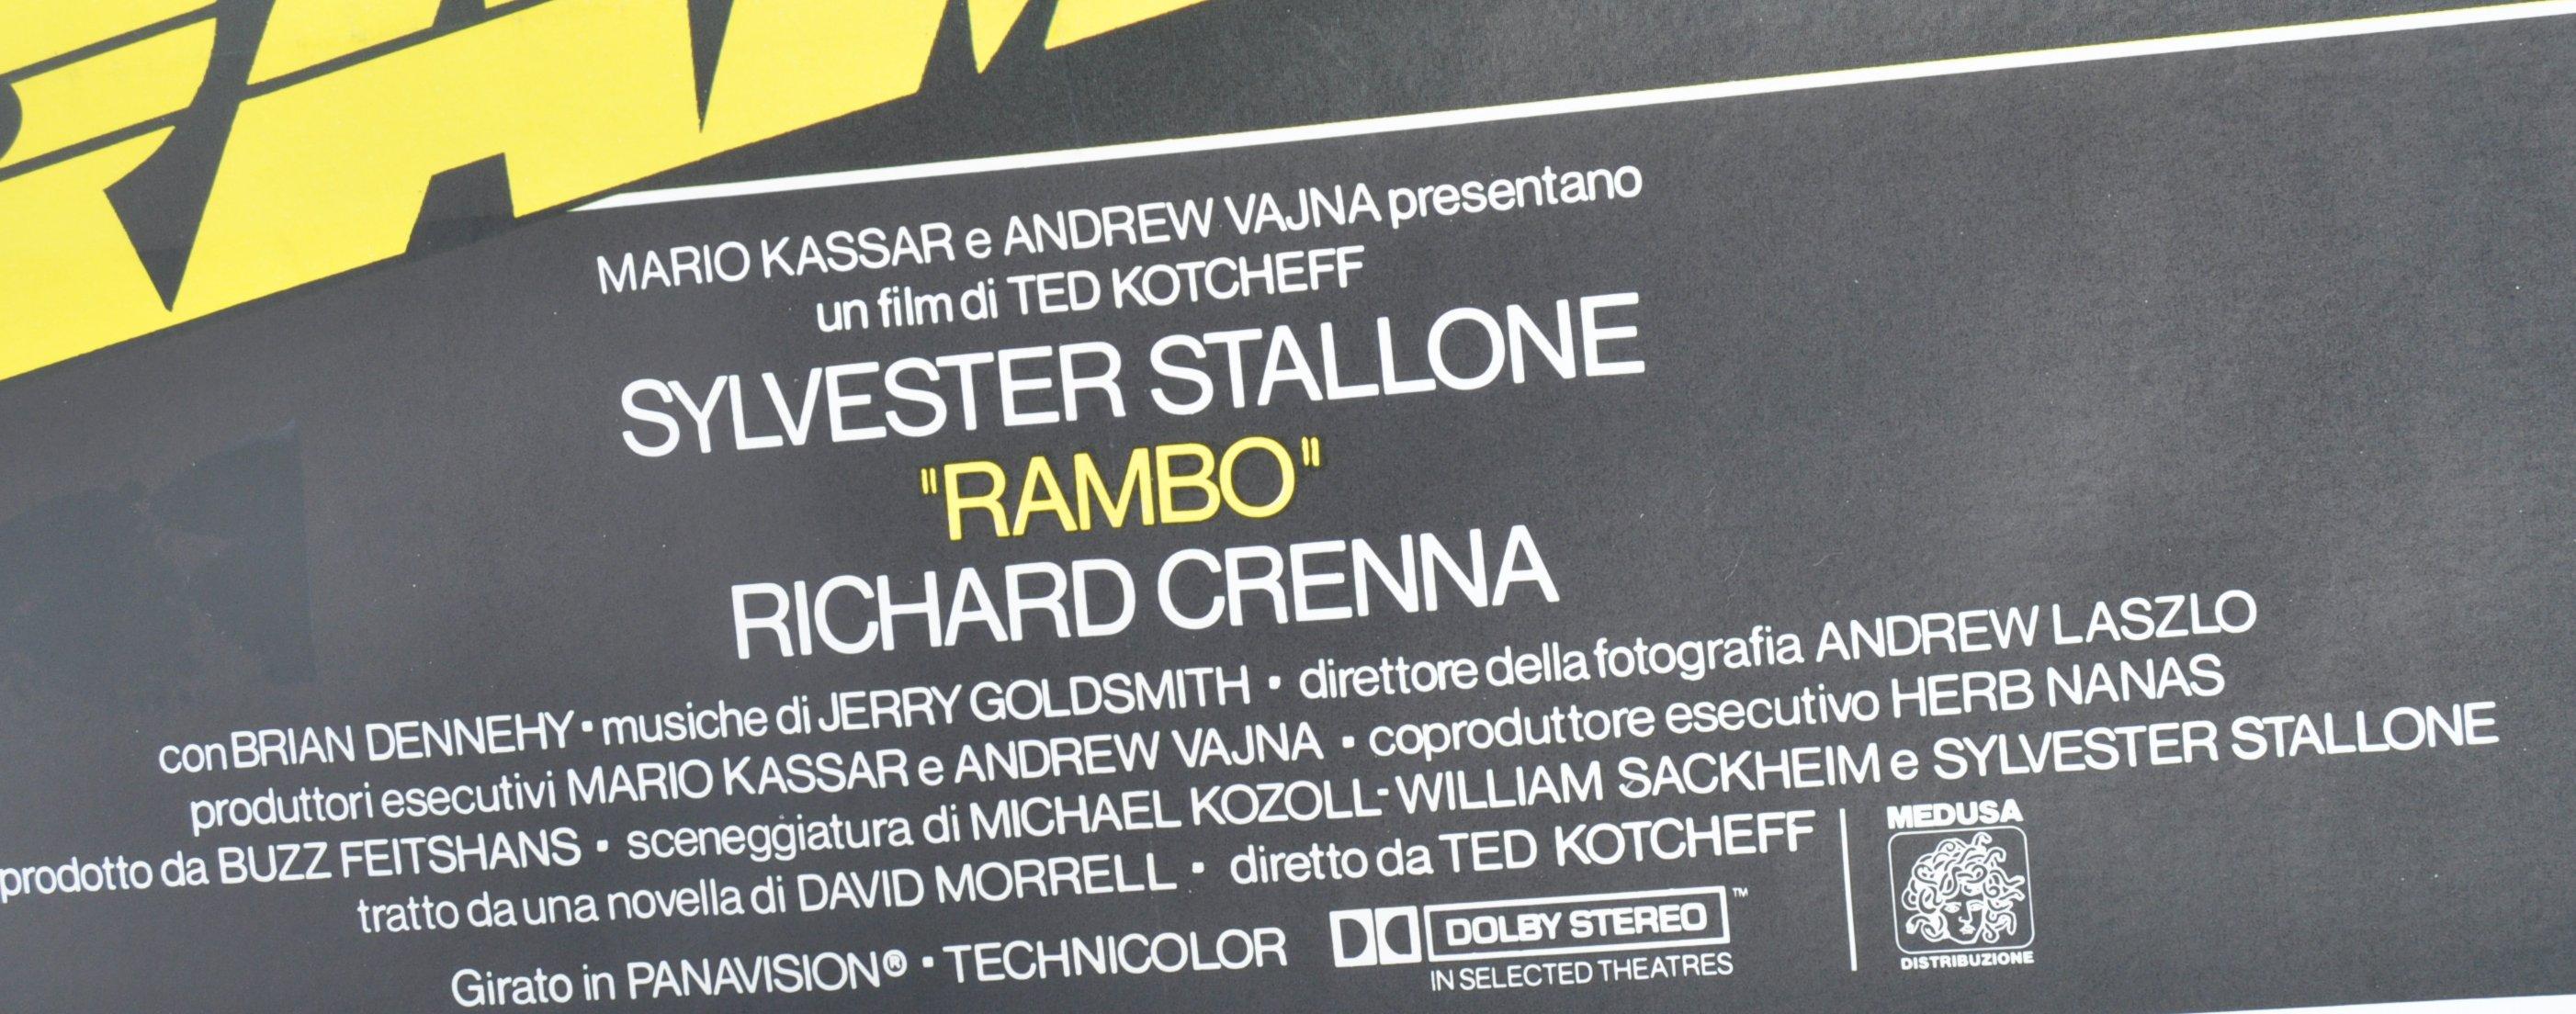 ORIGINAL 1980'S RAMBO FIRST BLOOD ITALIAN MOVIE PO - Image 3 of 5